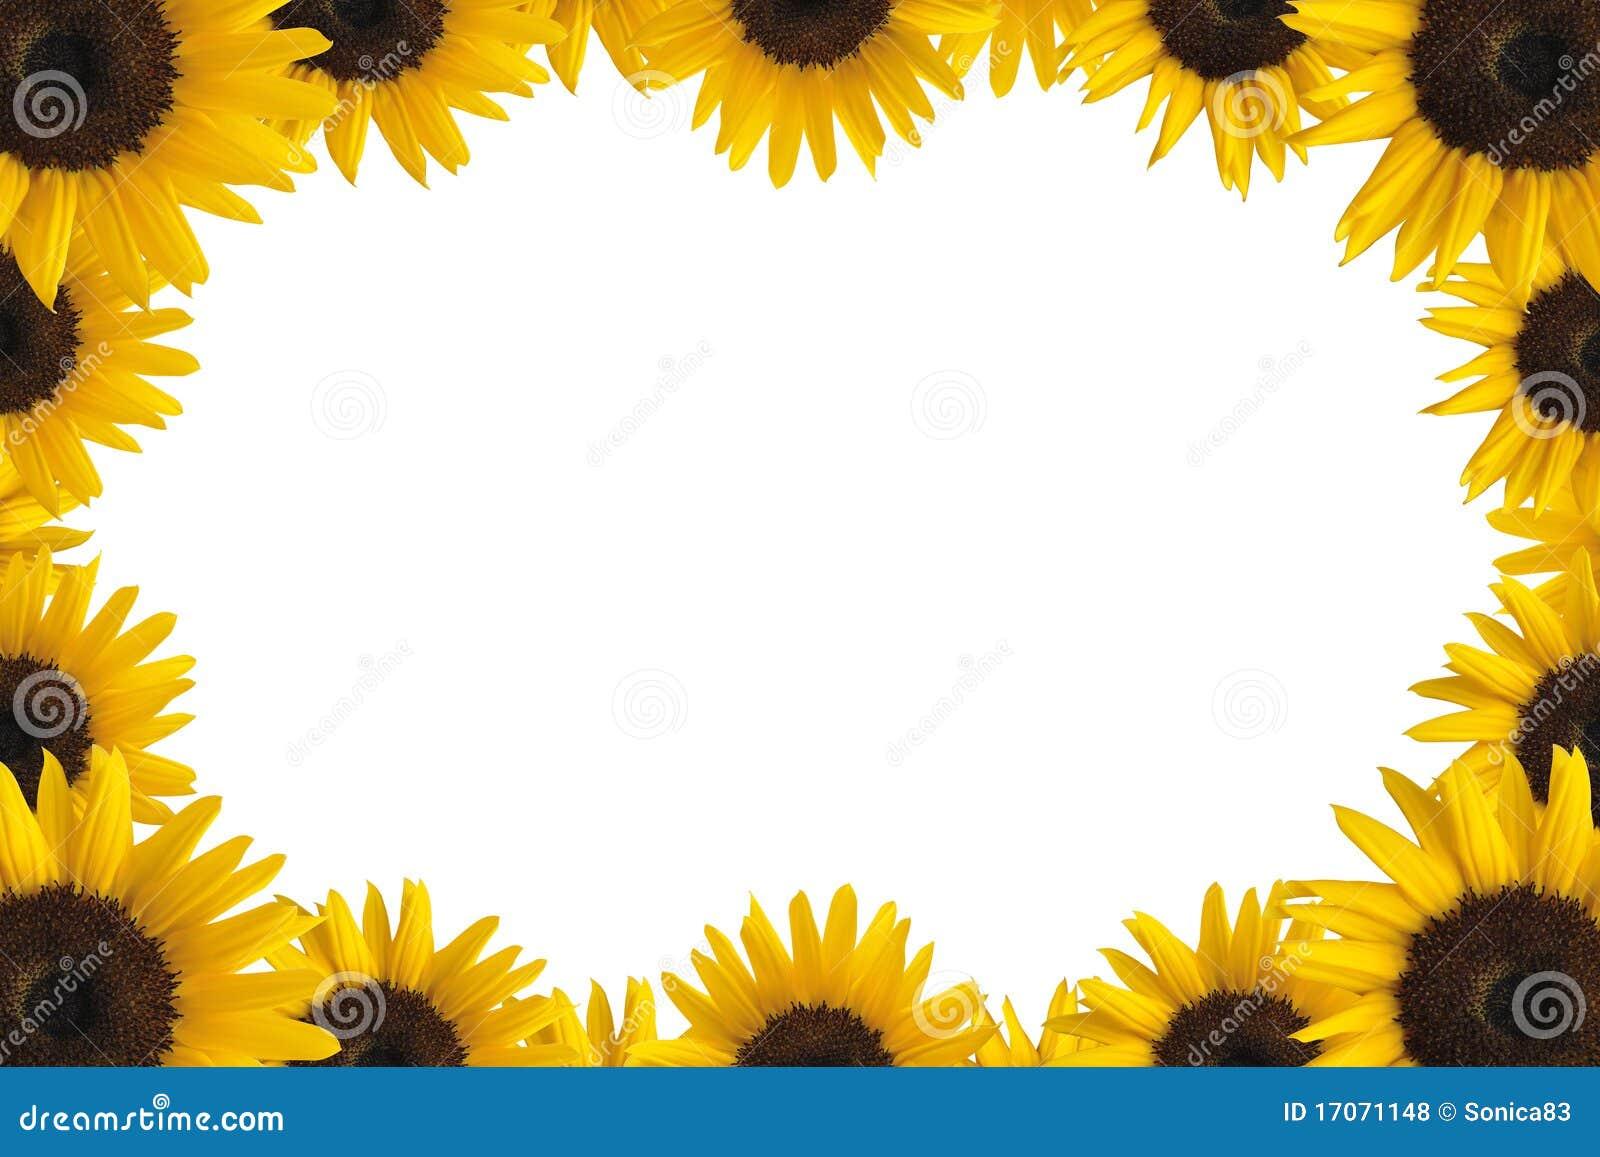 Sunflower Frame Stock Images - 3,718 Photos